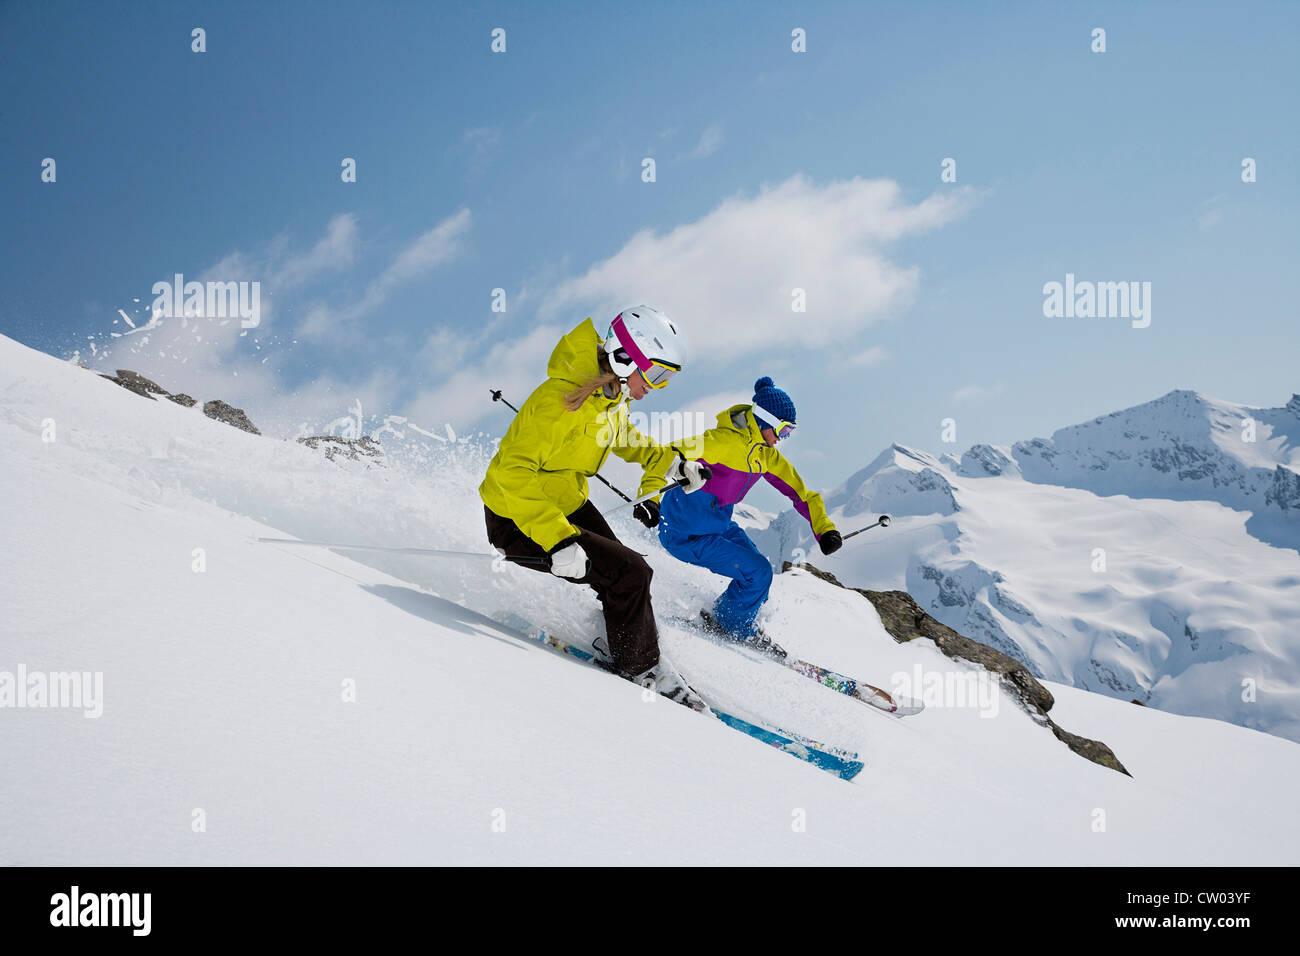 Skiers coasting on snowy slope - Stock Image